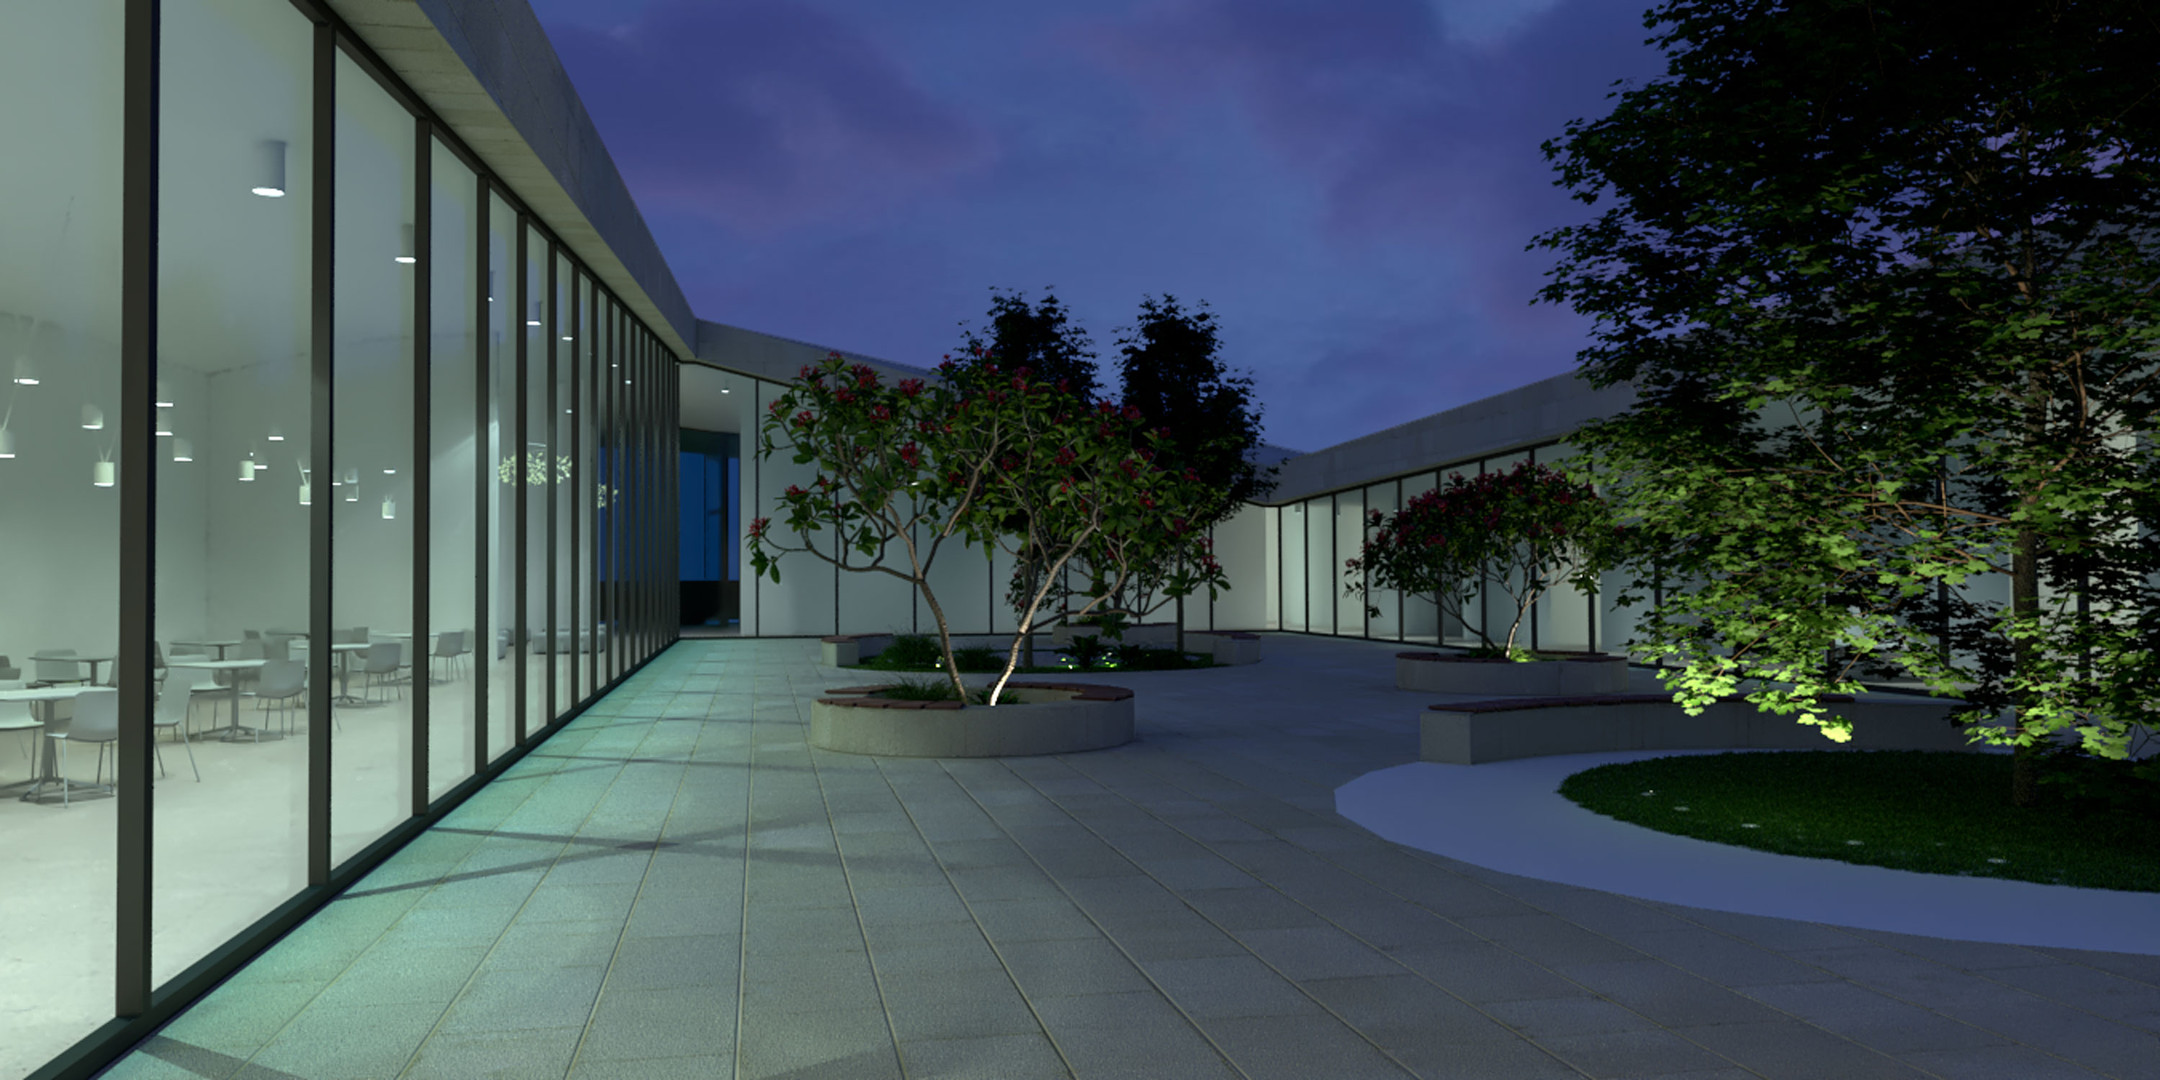 arquitectura-senmais-19.13b.09.jpg